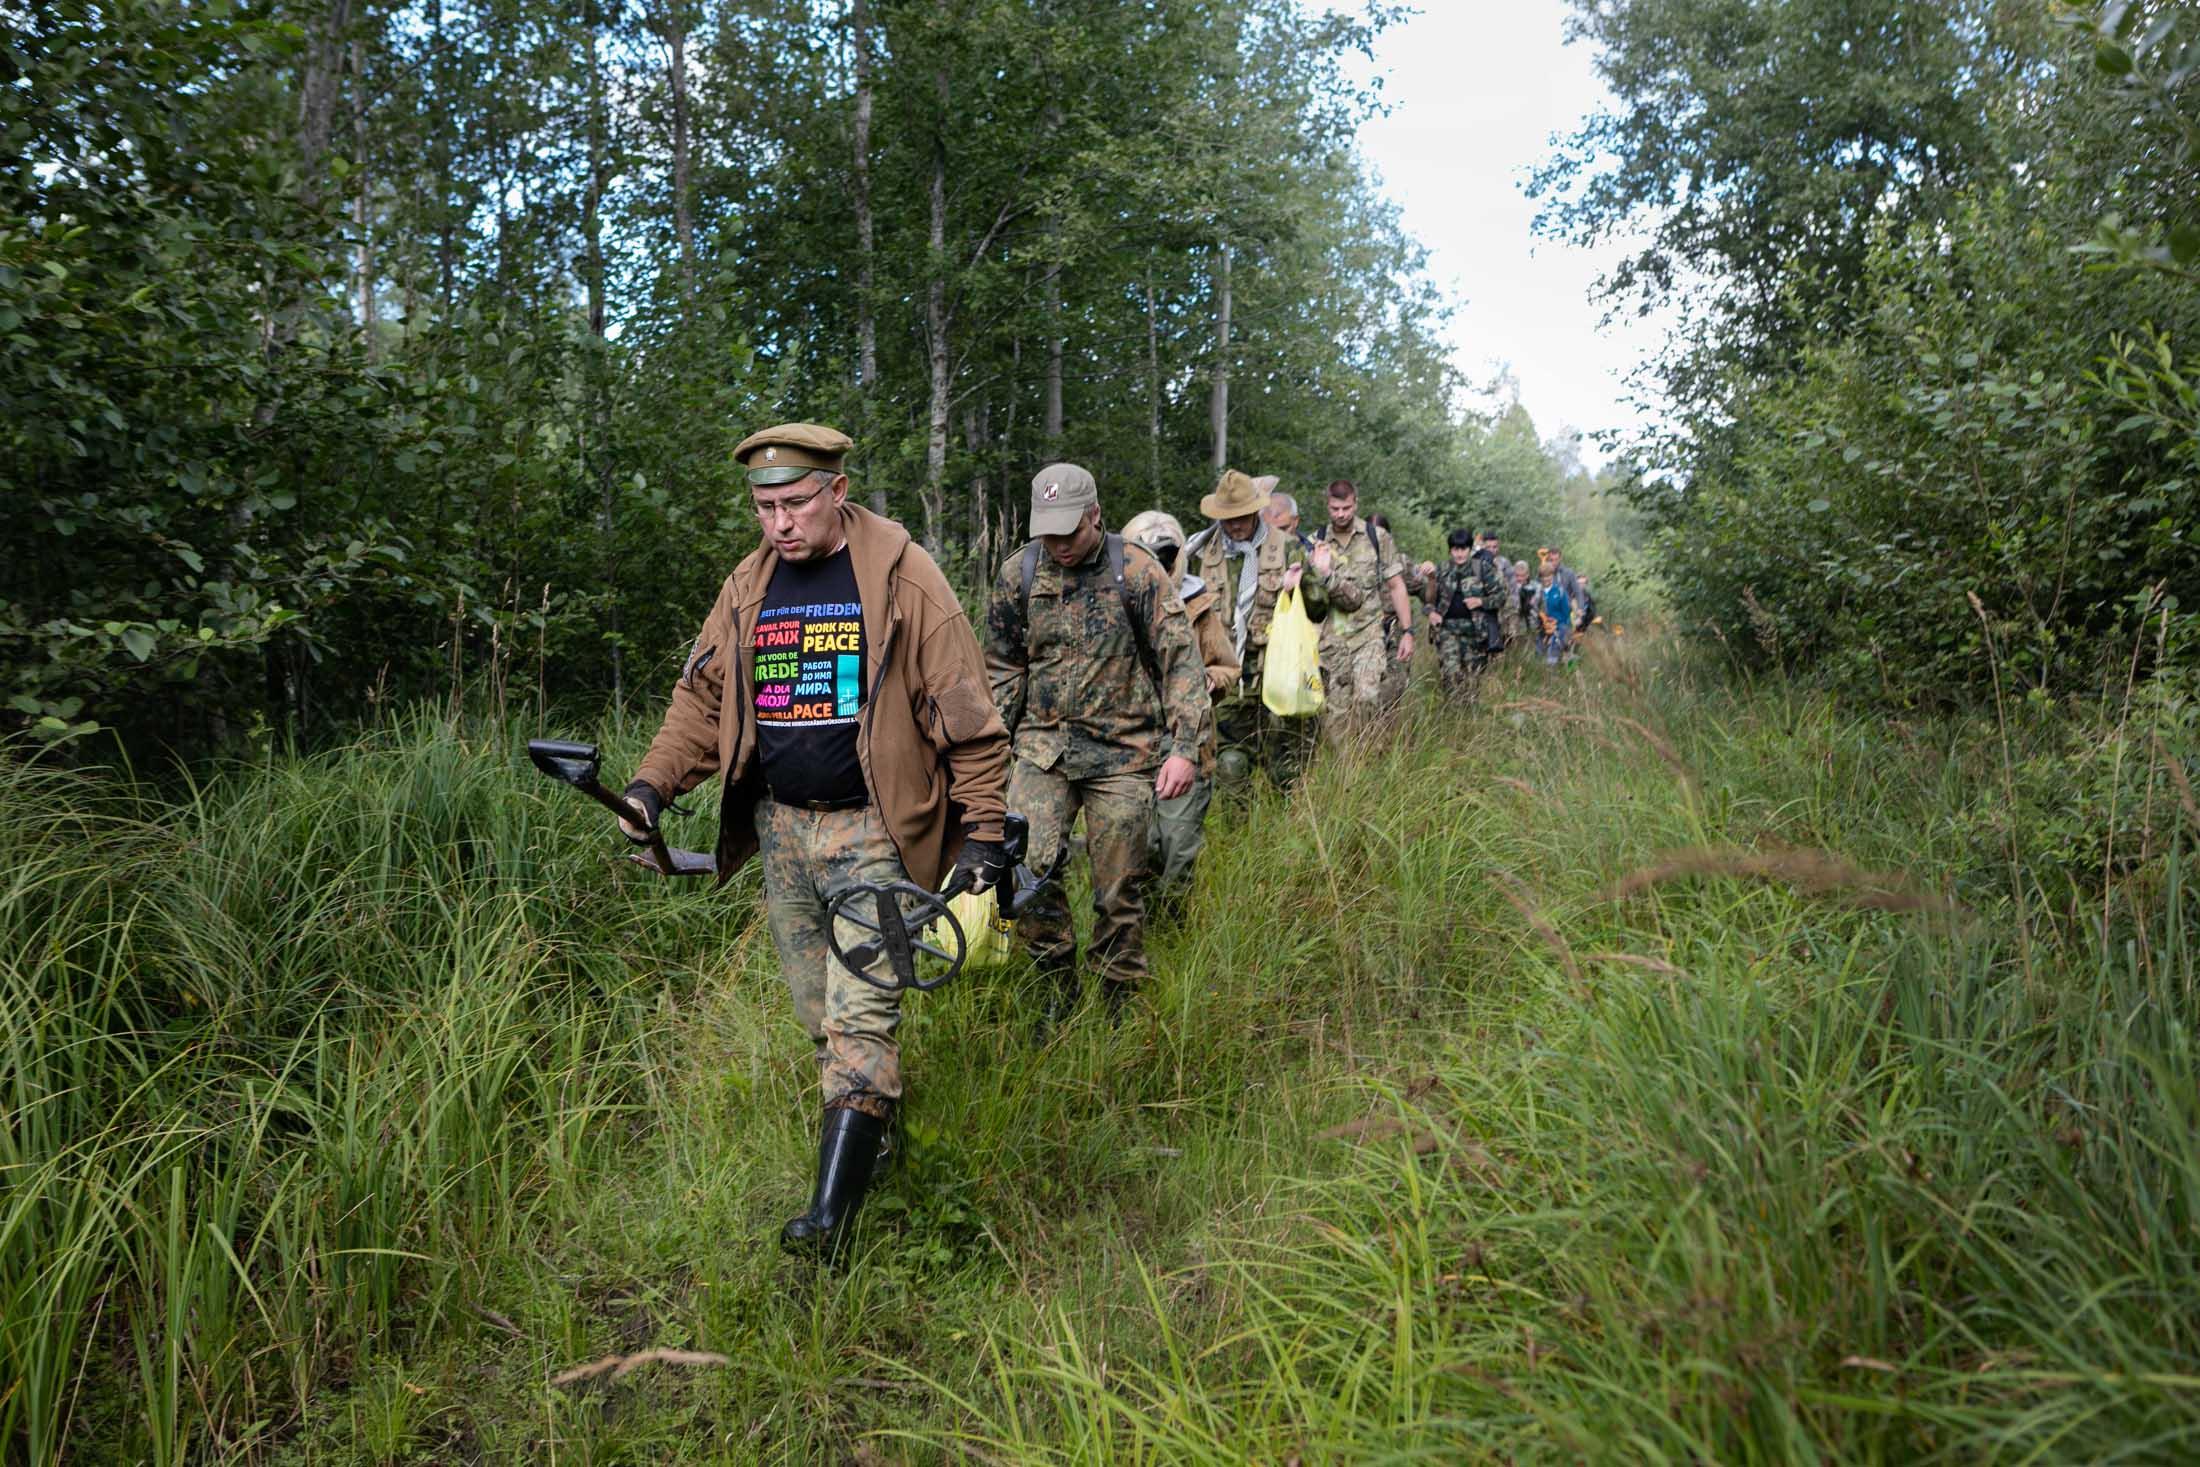 Digging for World War II History in Latvia's Battlefields